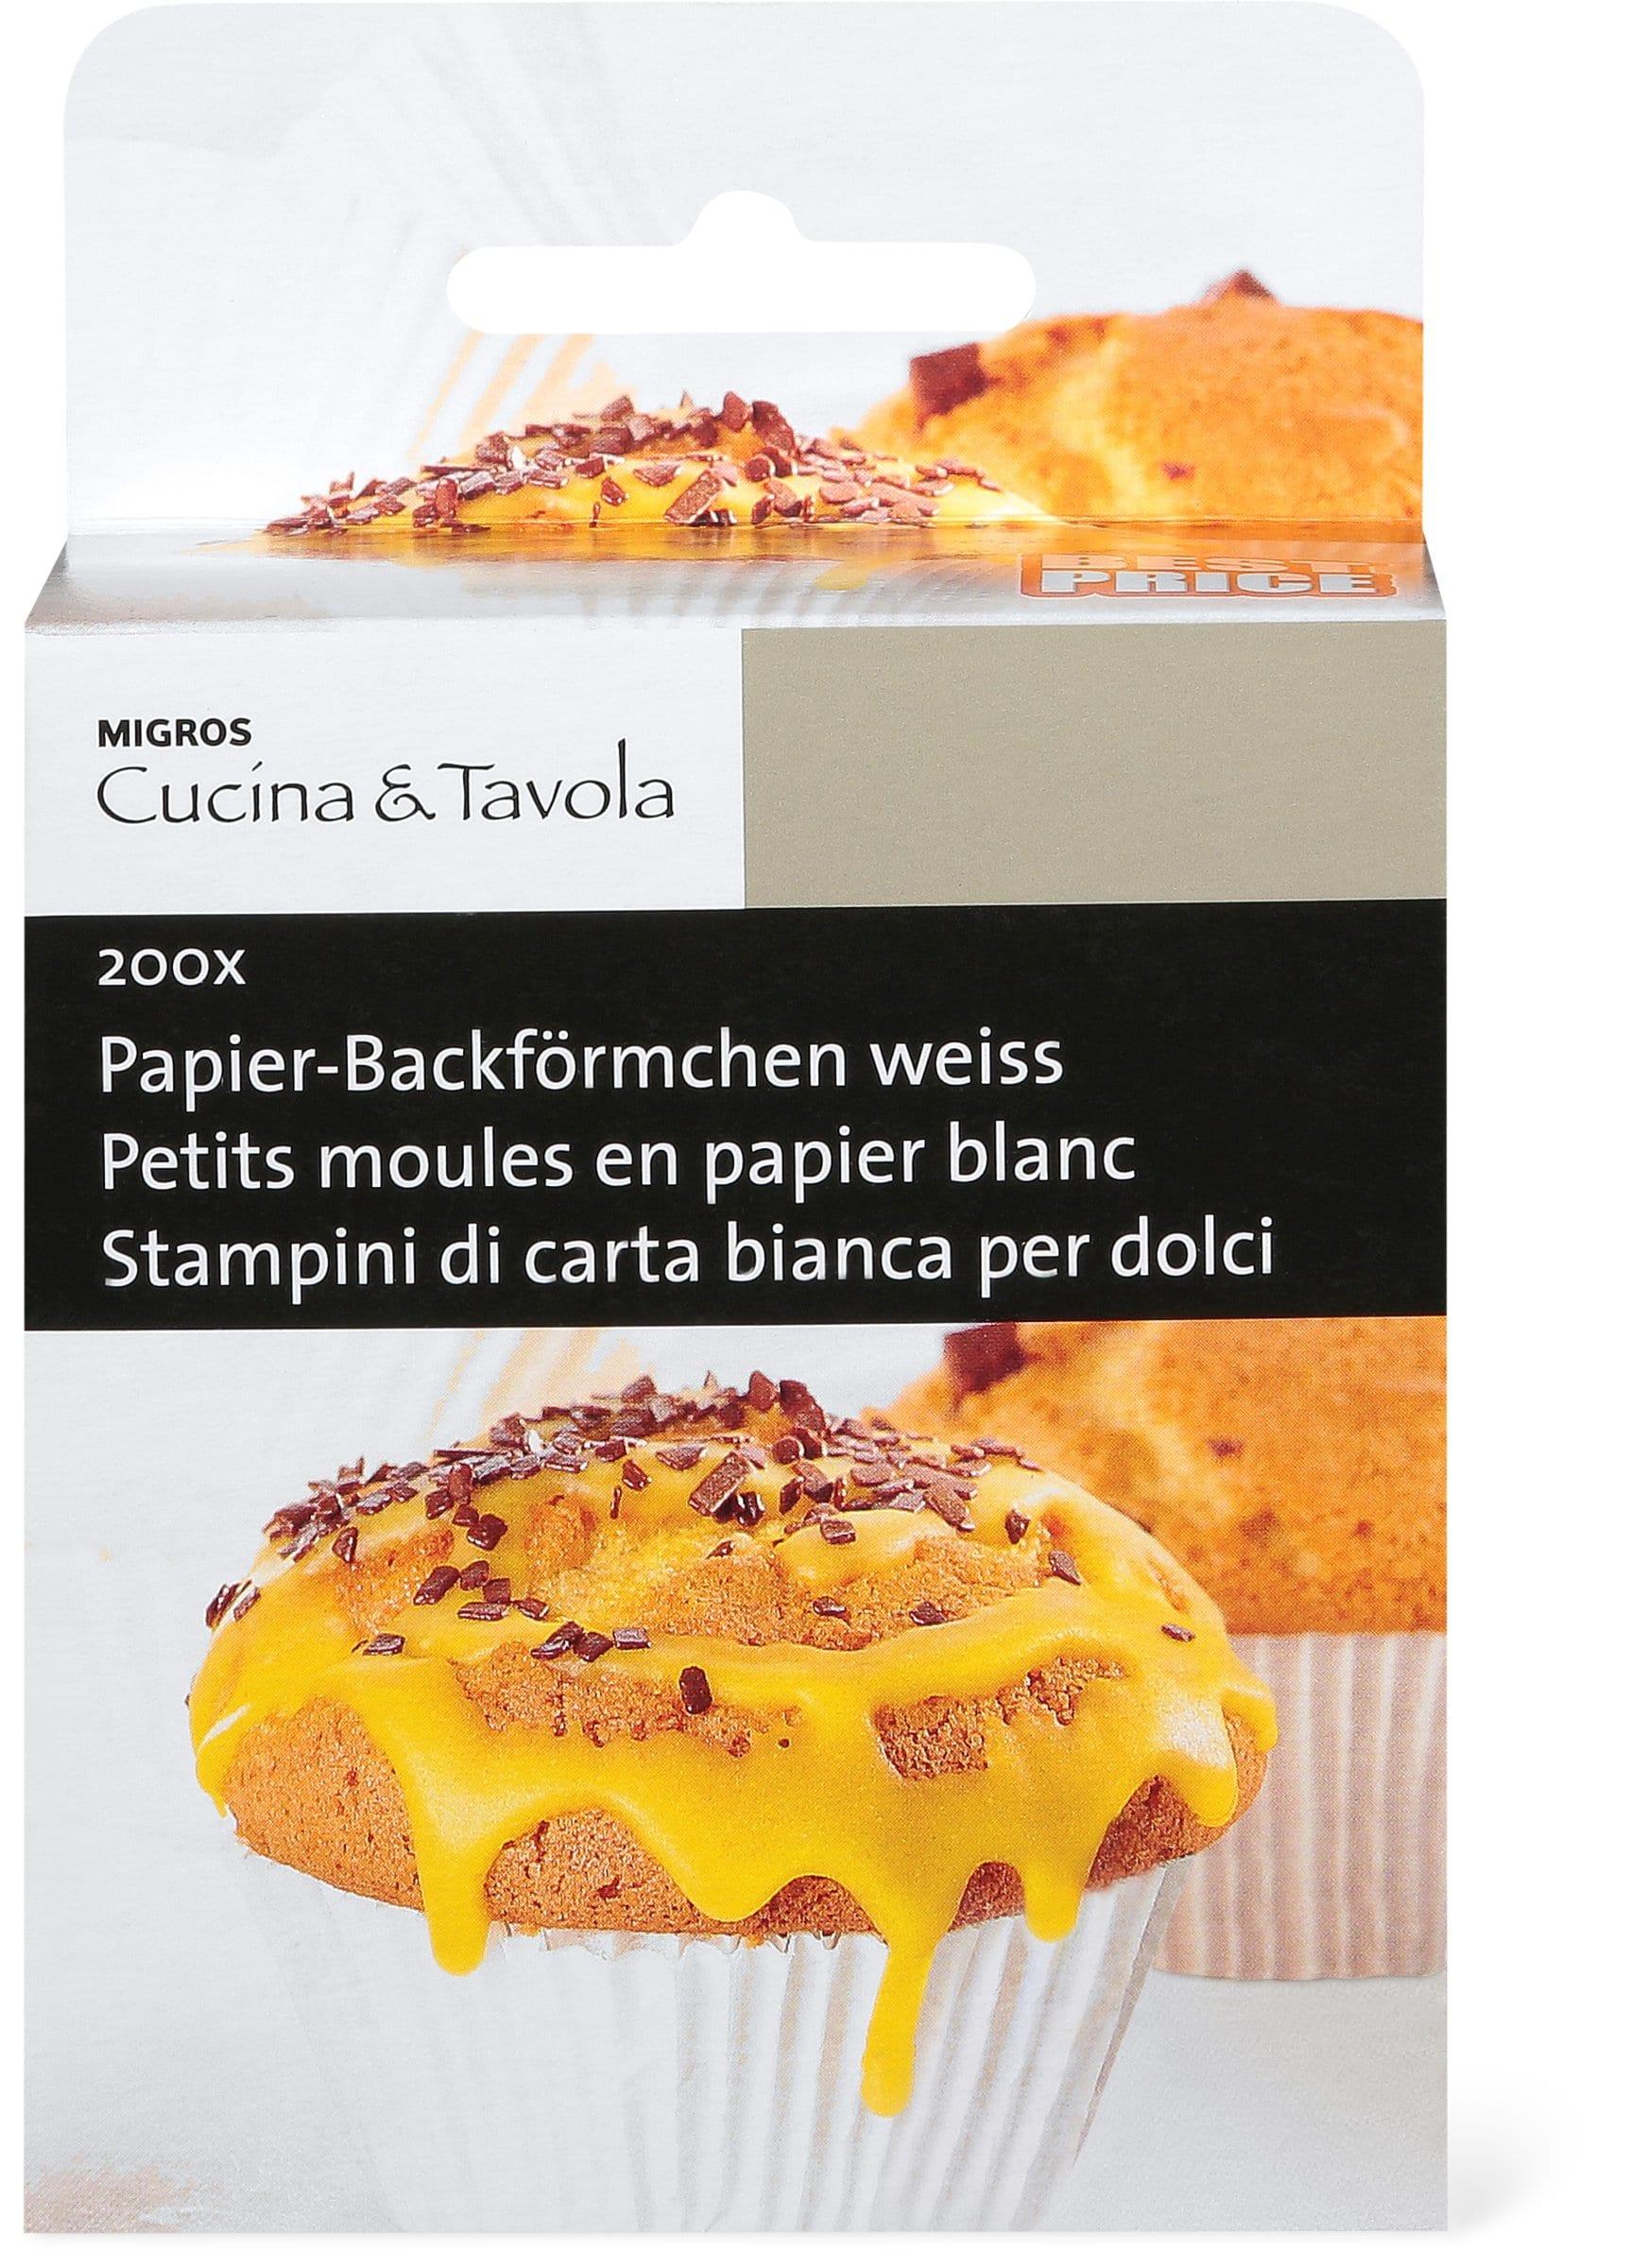 Cucina & Tavola Petits moules en papier